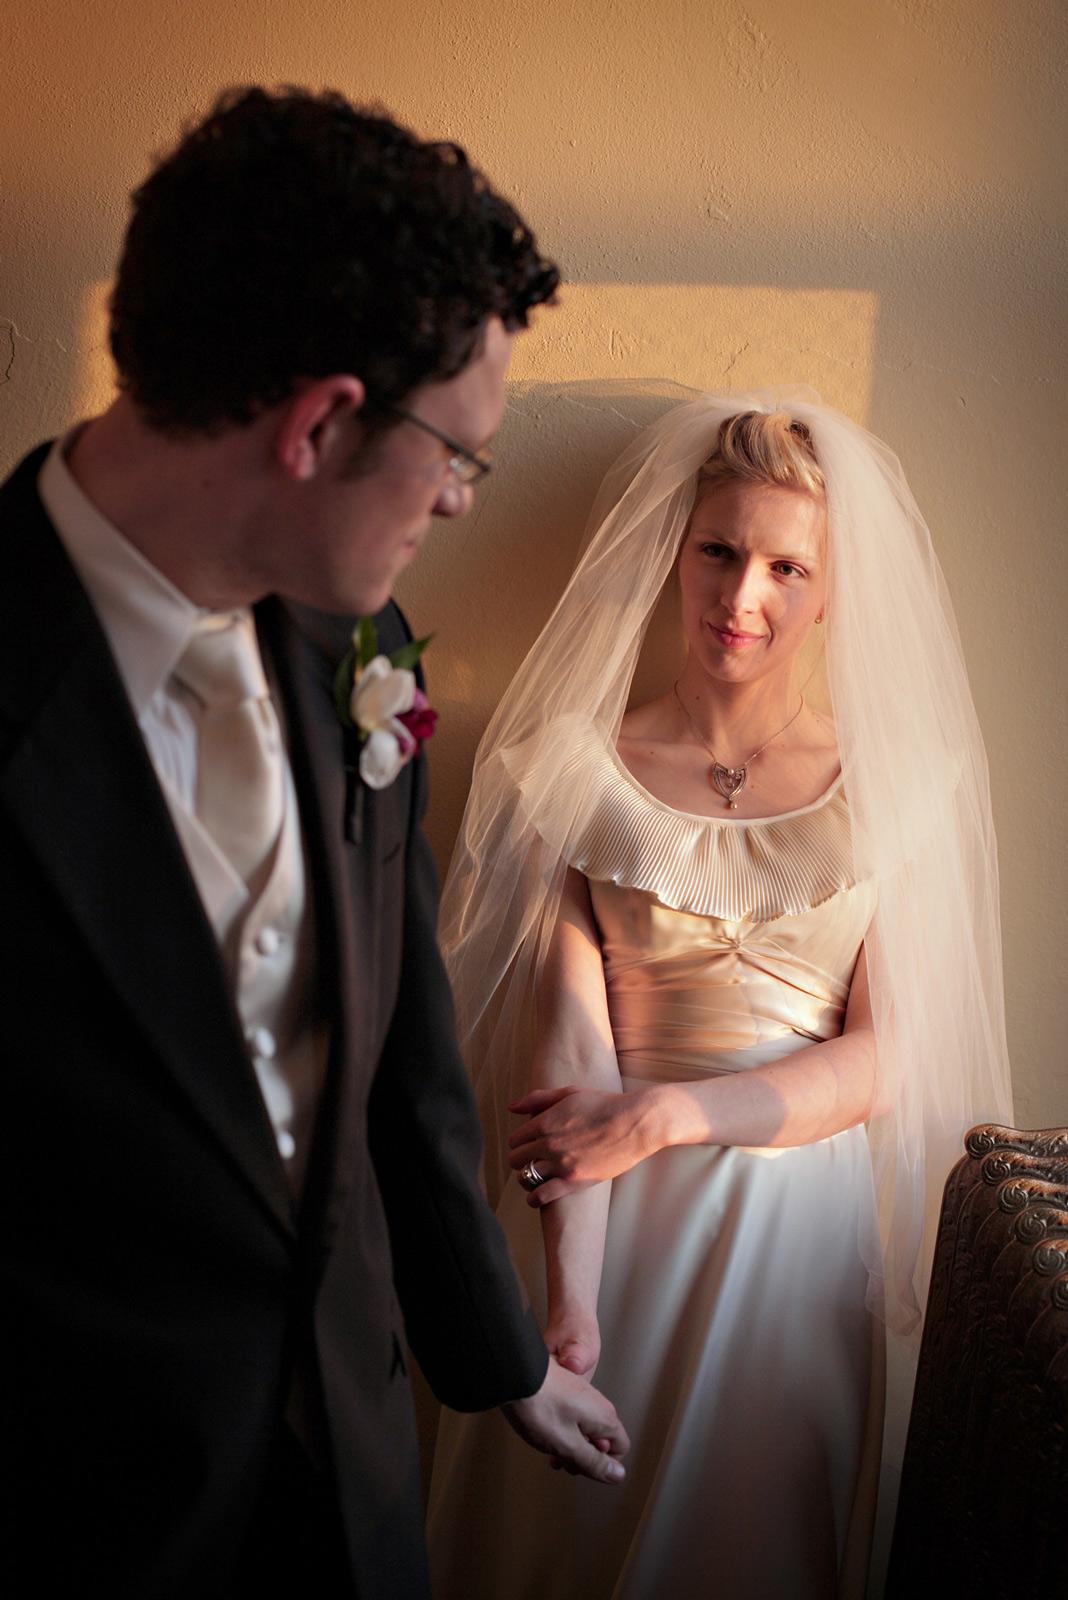 minnesota-wedding-photographers-mark-kegans-954.jpg